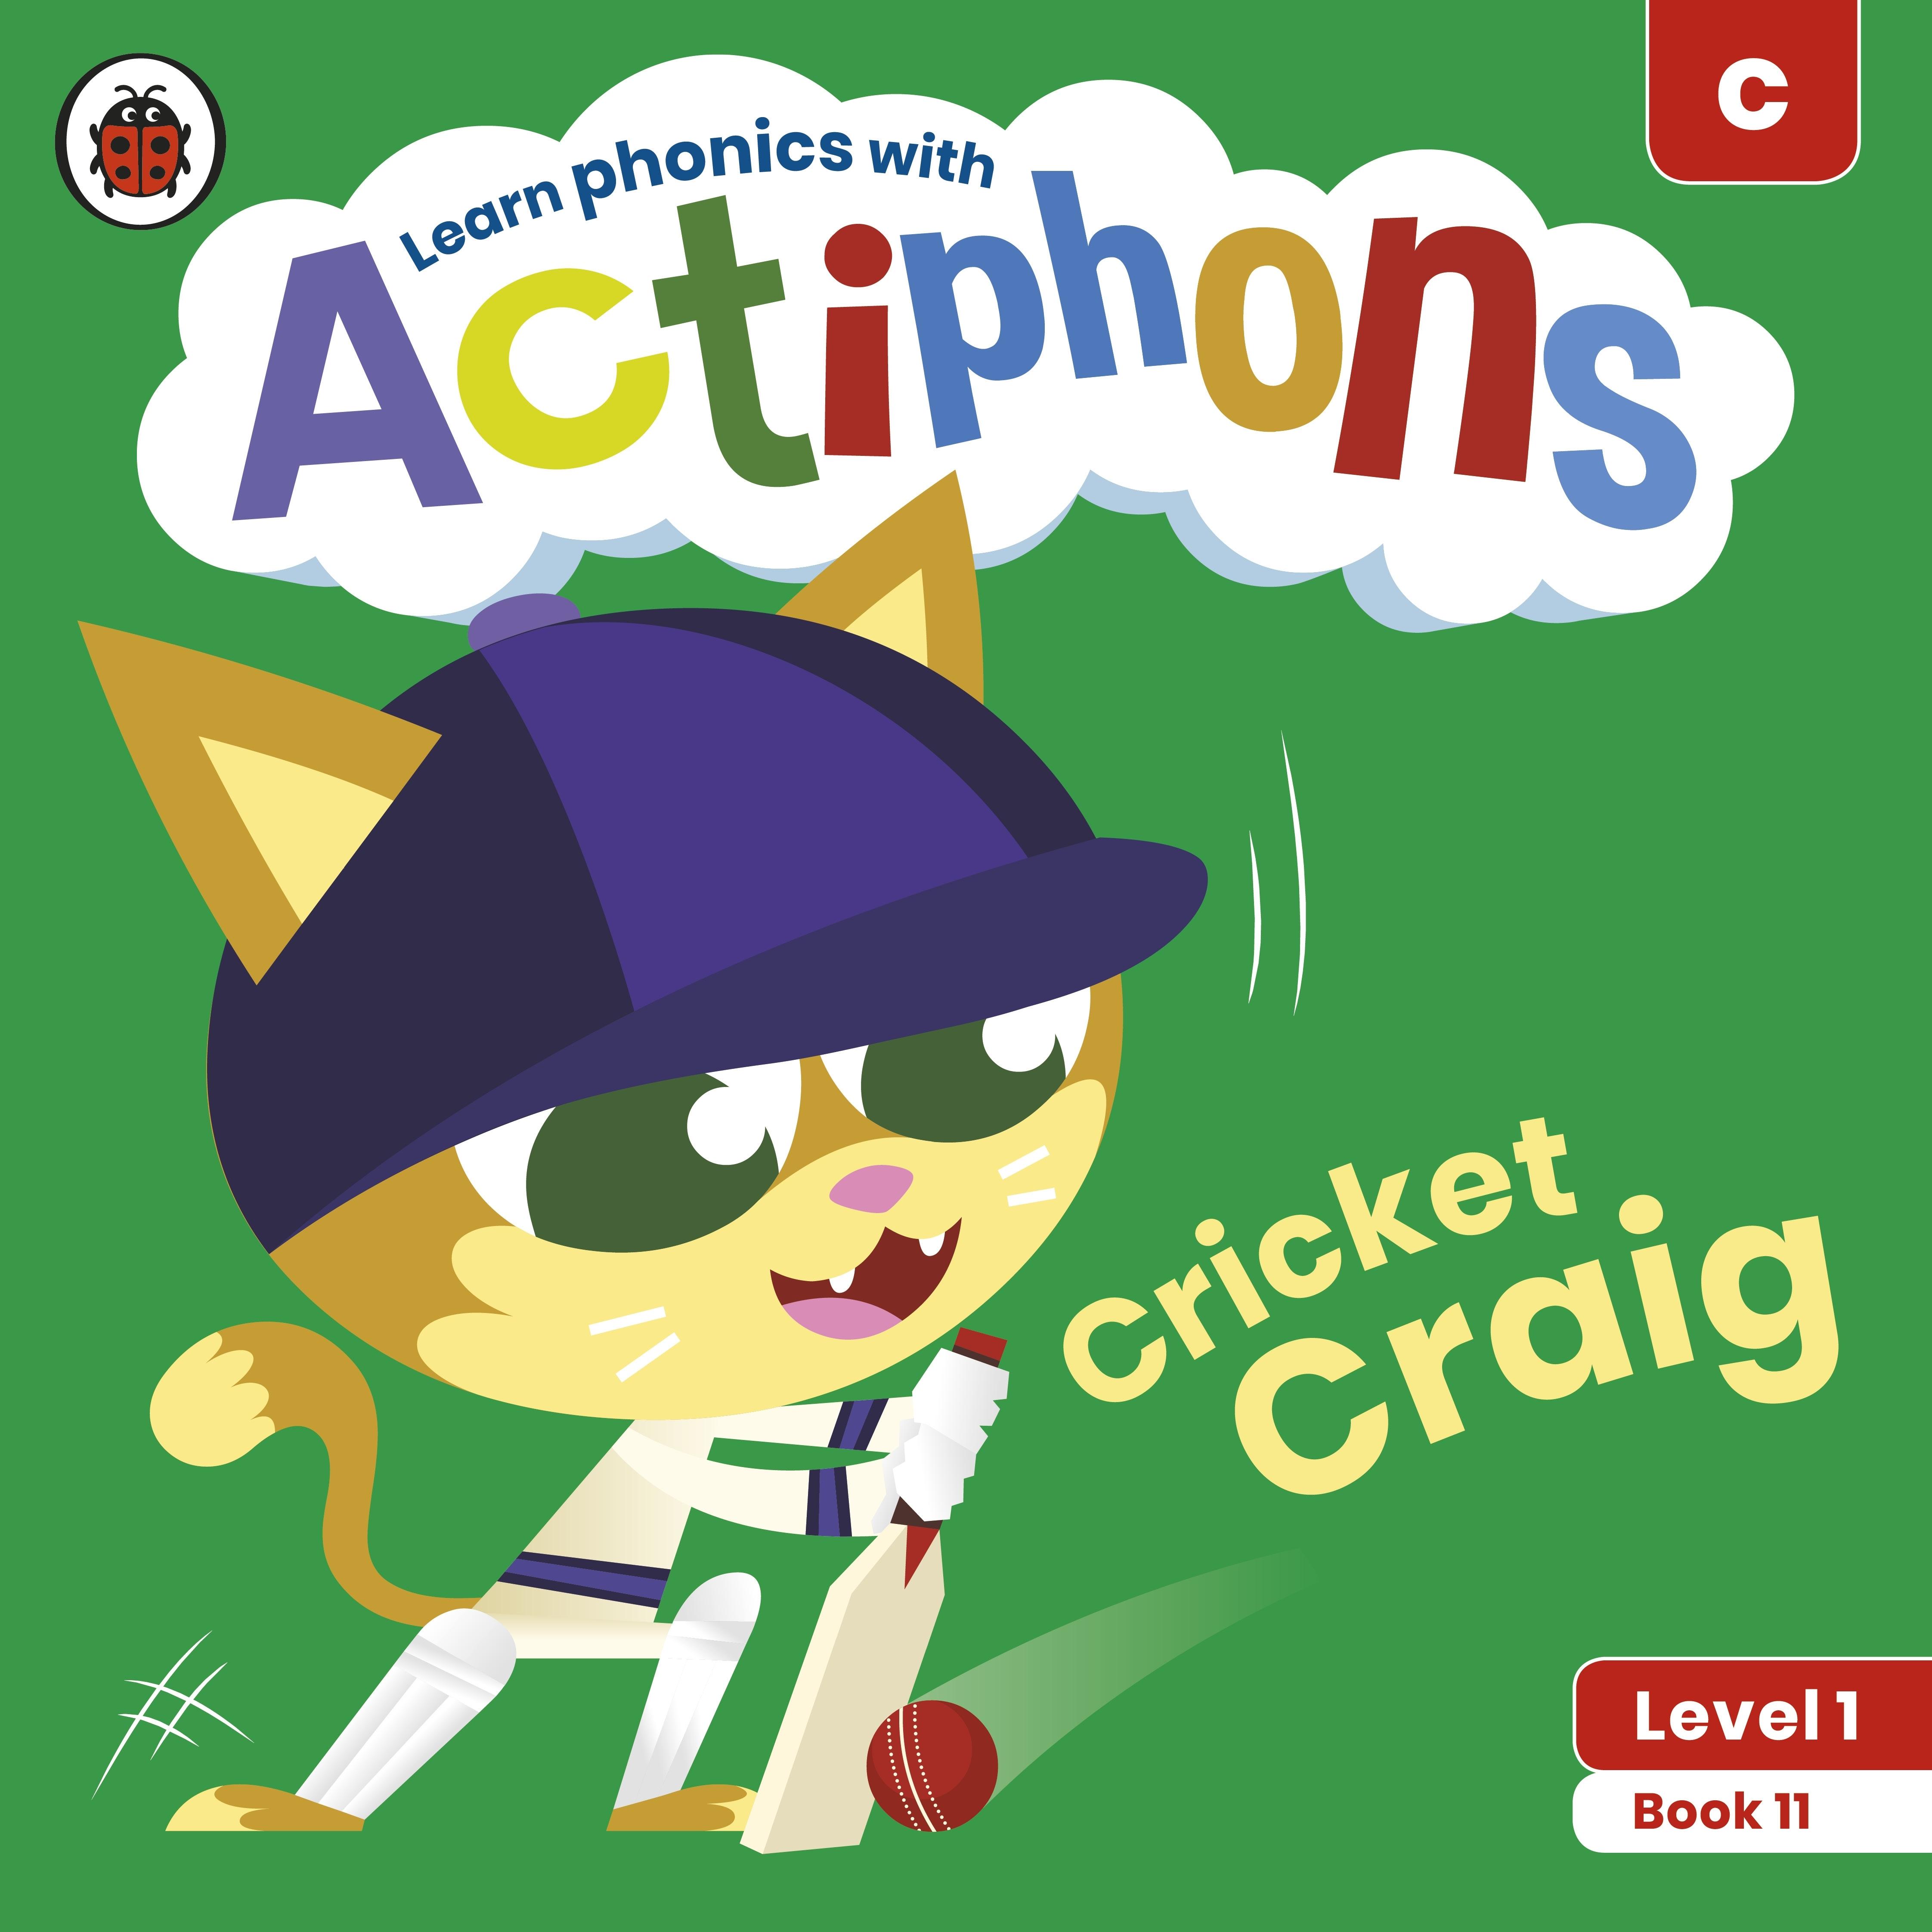 Actiphons Level 1 Book 11 Cricket Craig